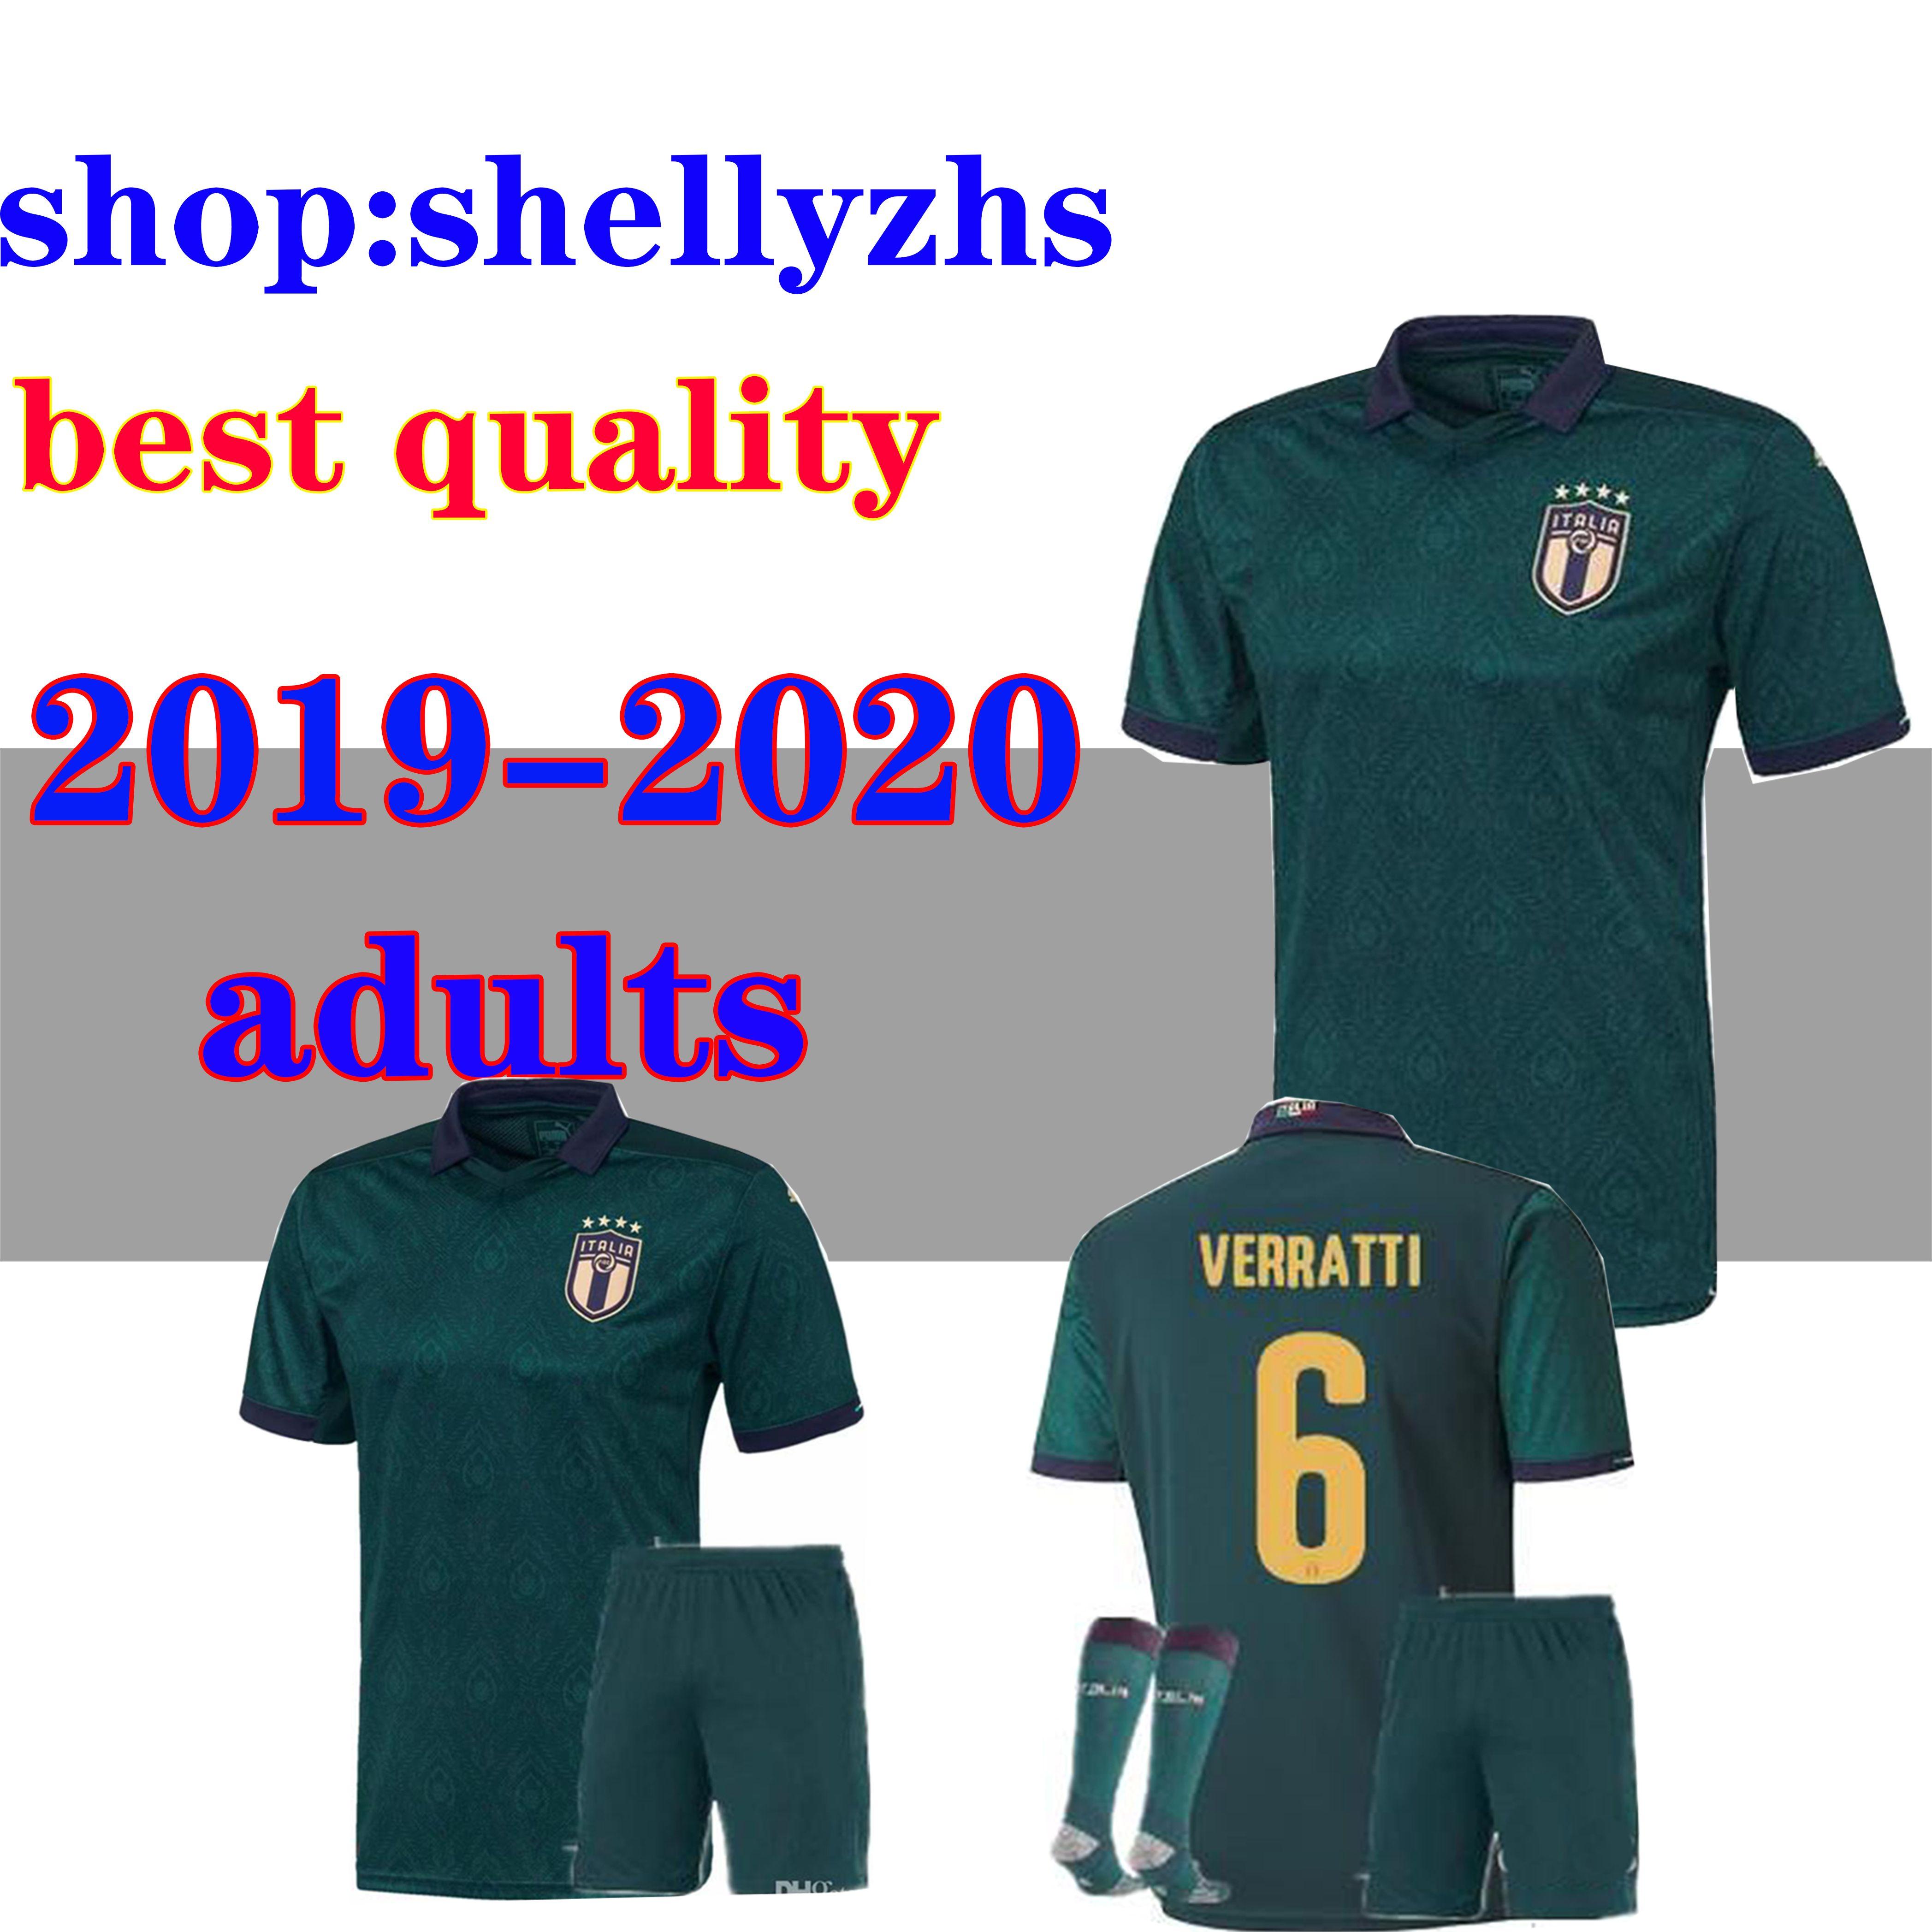 19 20 ITALY 3rd kit+socks men soccer Jerseys 2019 2020 uropean Cup national team Italy BONUCCI IMMOBILE INSIGNE Third Football jersey shirt